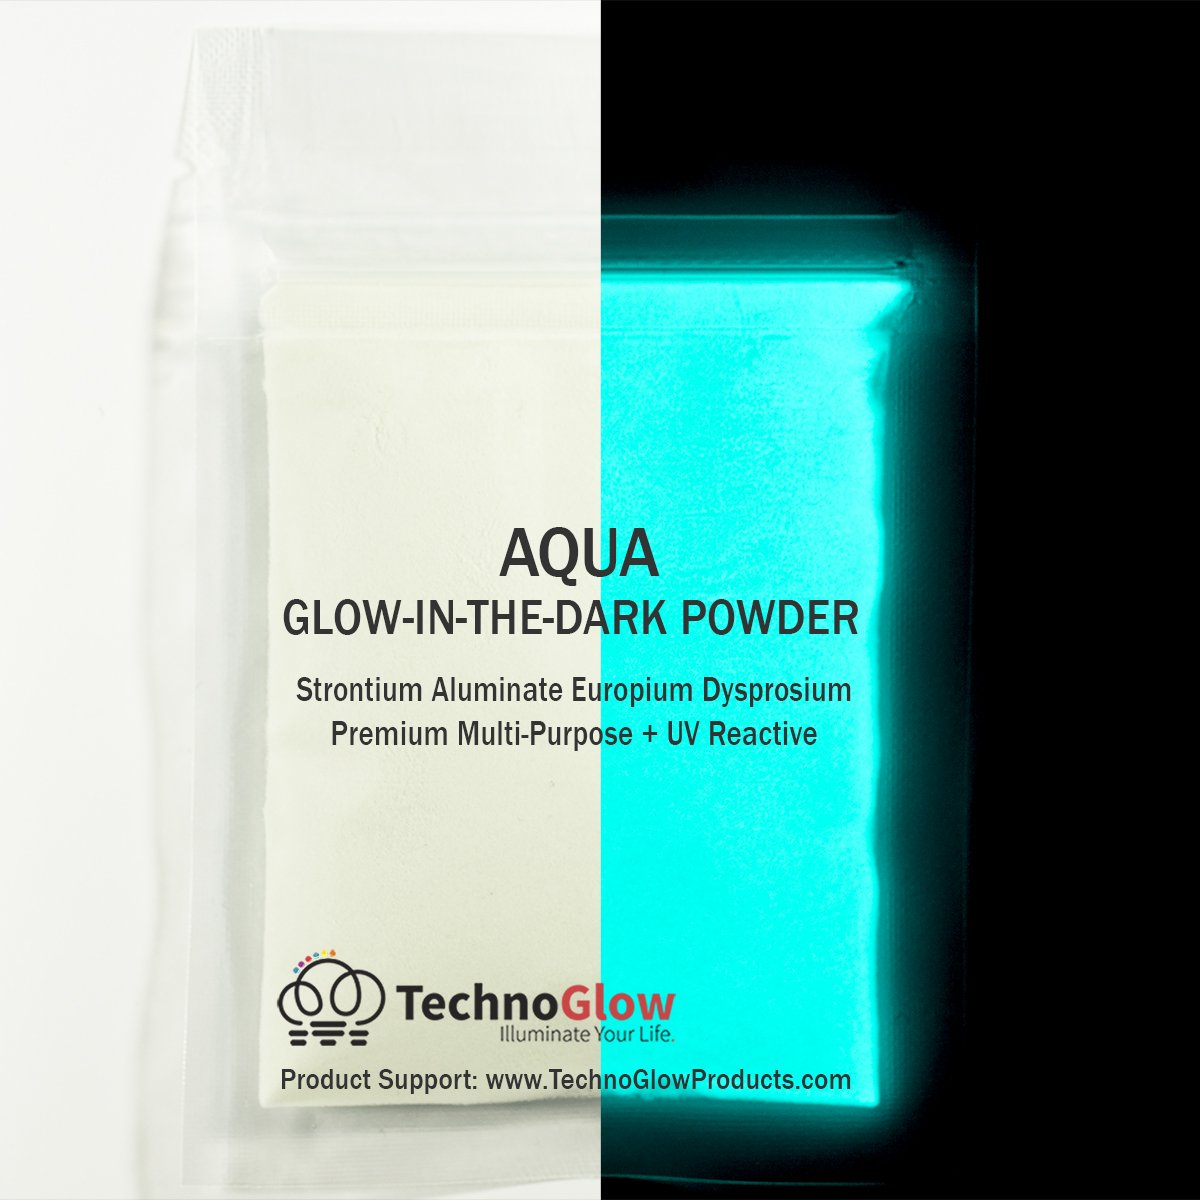 Aqua Glow in the Dark & UV Powder; 100-150 Microns (1 KG)